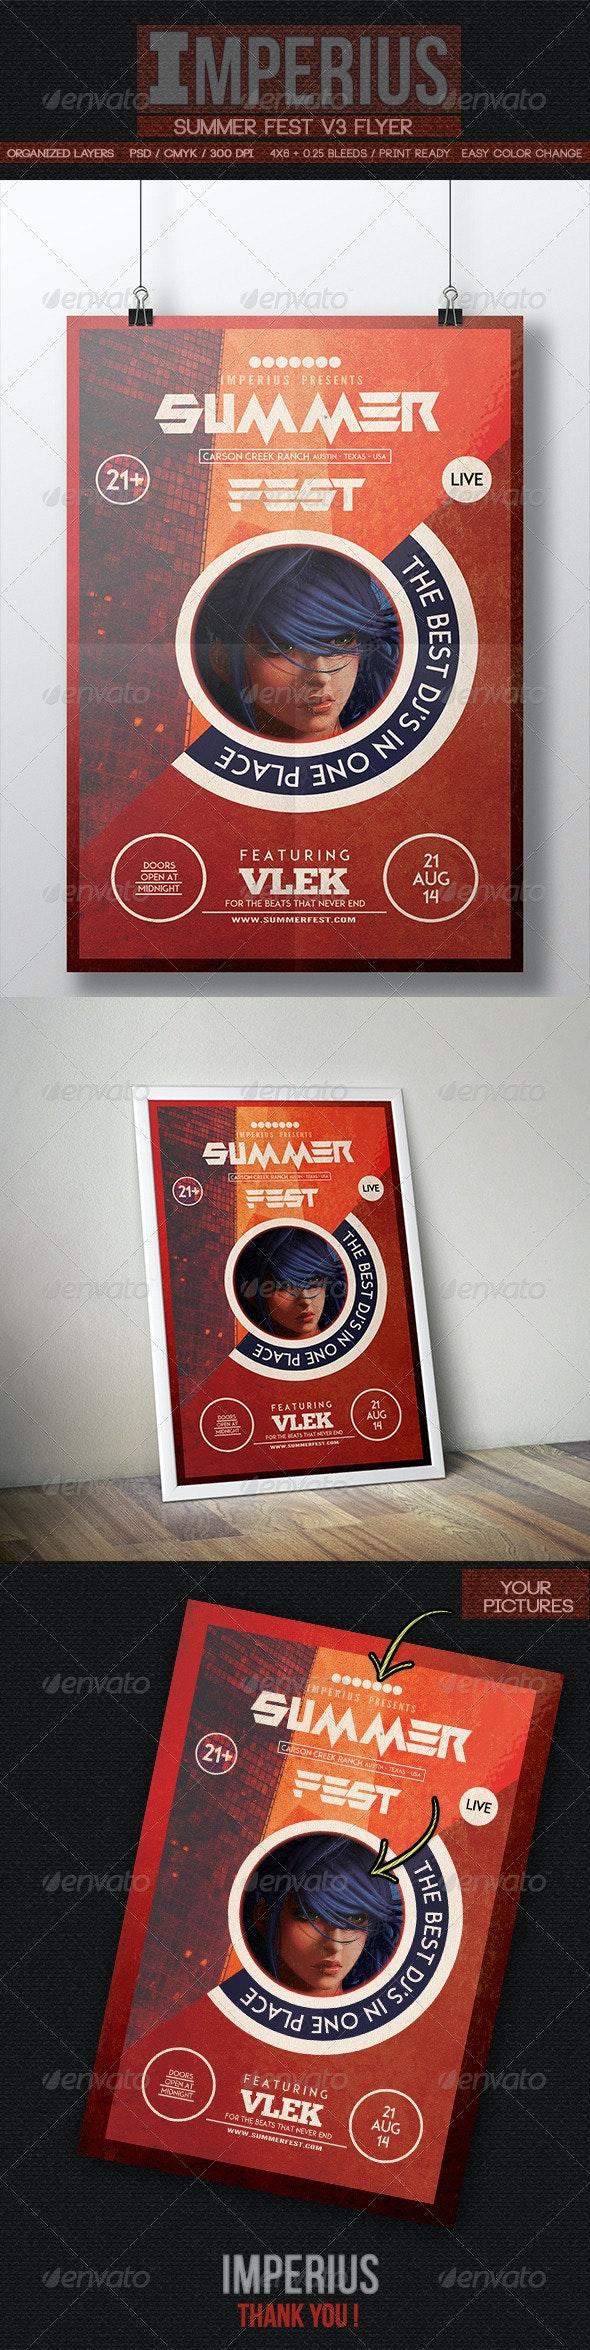 Summer Fest V3 - Flyers Print Templates